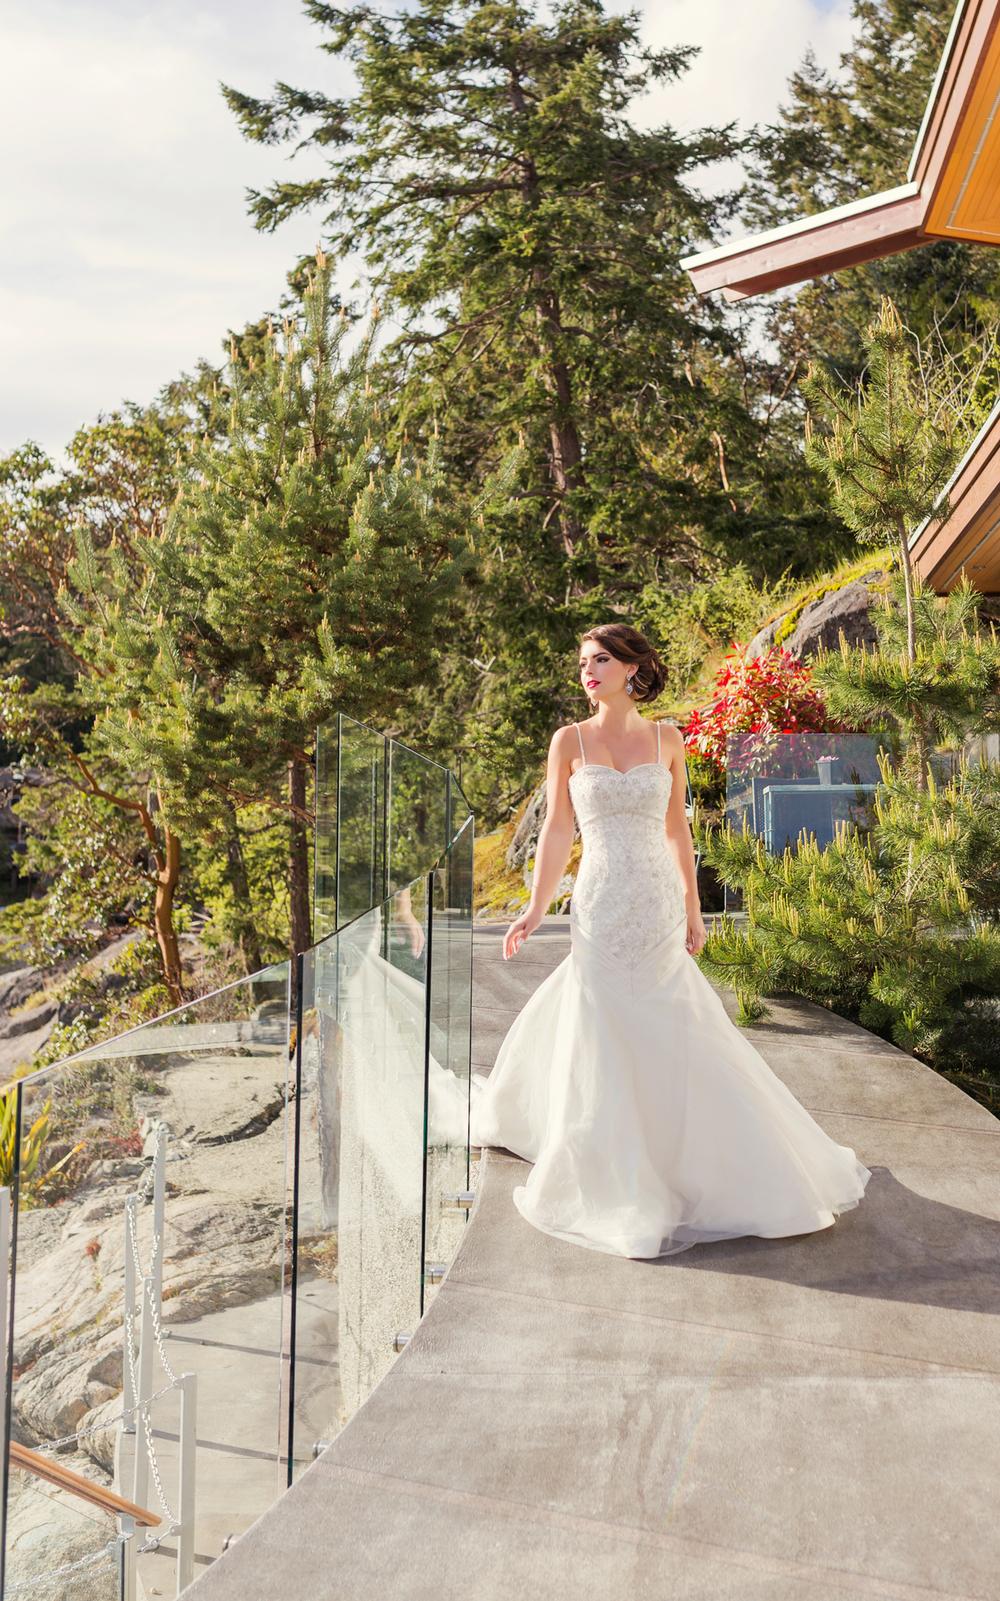 IMG_6531-BRIDAL-EDITORIAL-JENNIFER-PICARD-PHOTOGRAPHY-FINE-ART-WEDDINGS.jpg